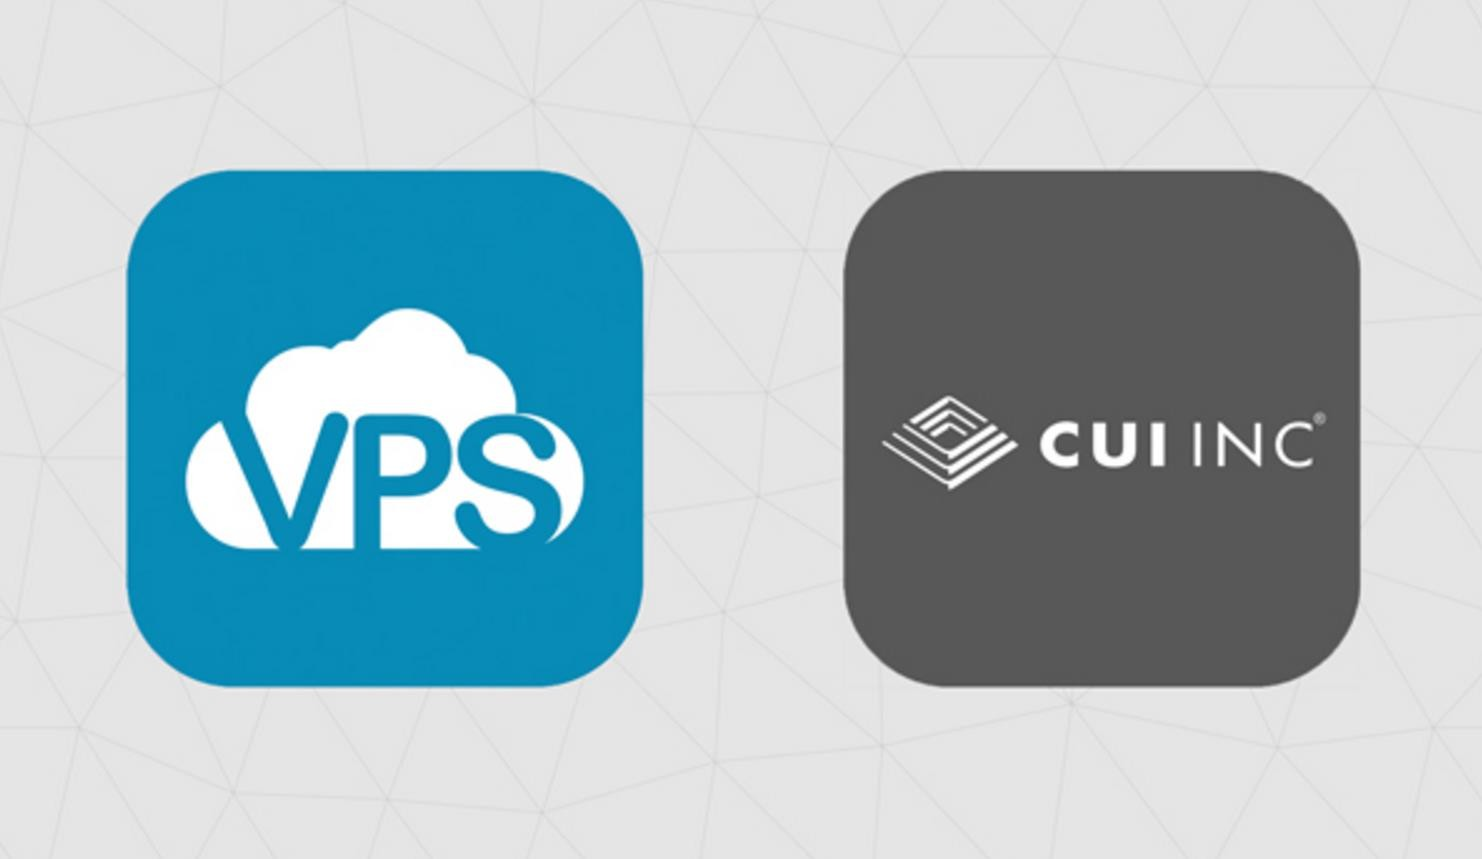 CUI和VPS联手开发智能高效的数据中心电源基础设施